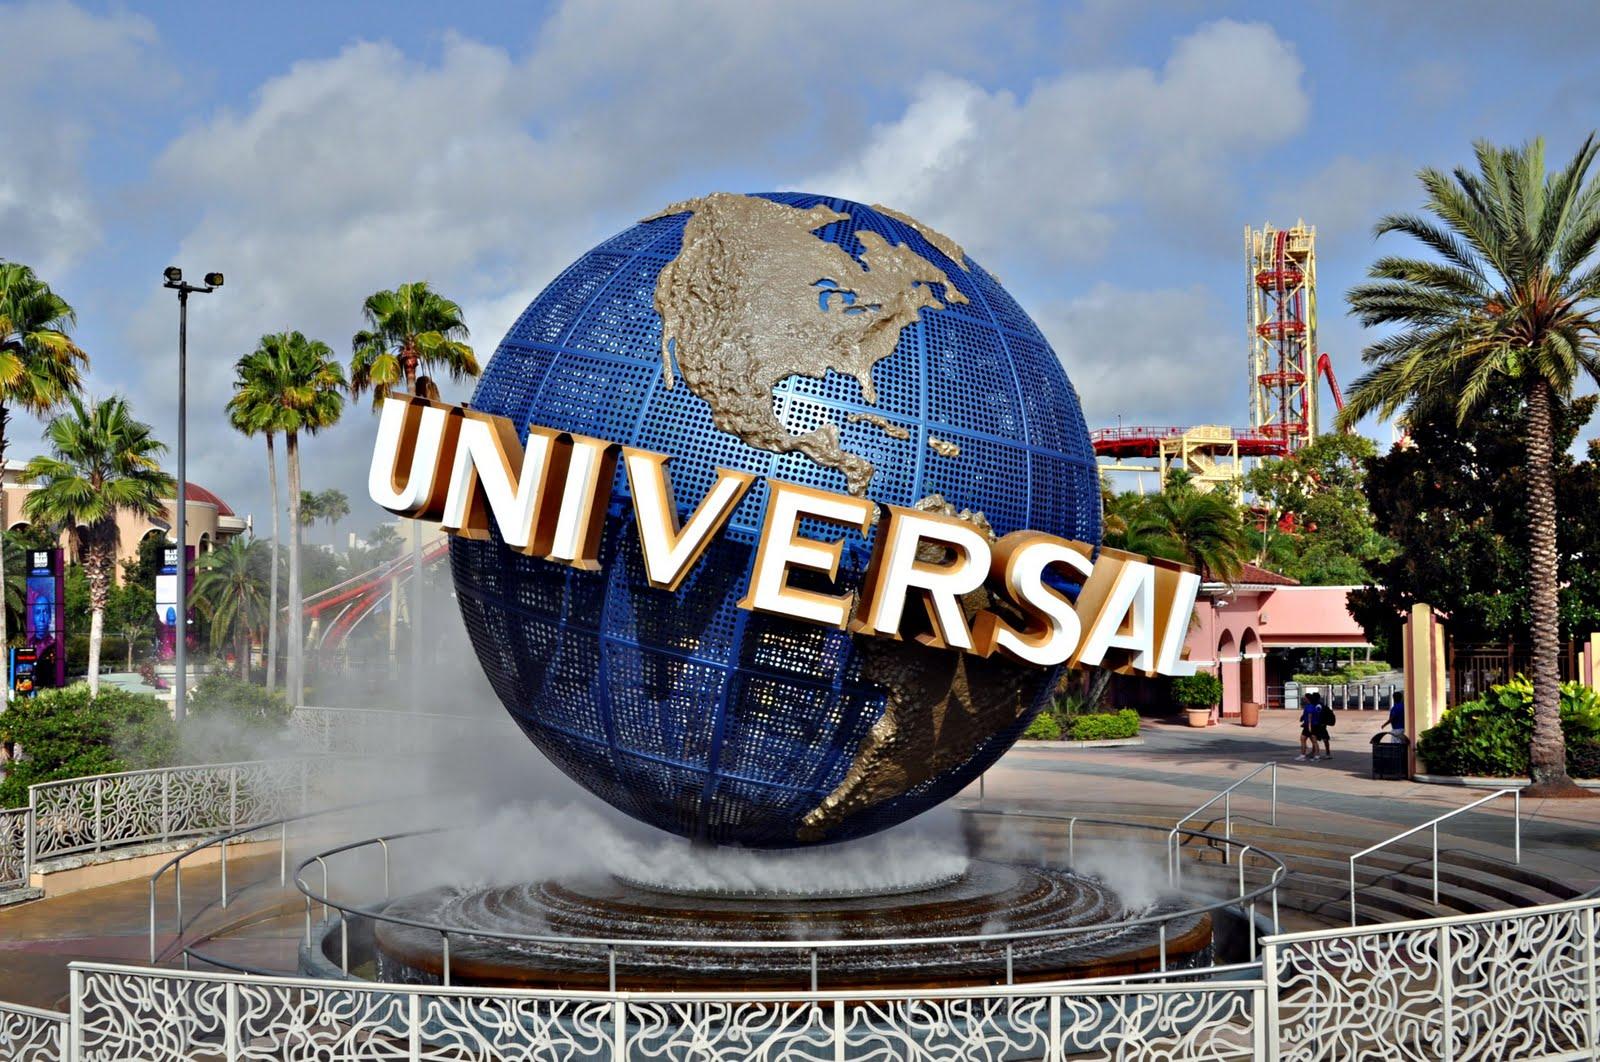 Visiting Universal Studios/Islands of Adventure Florida